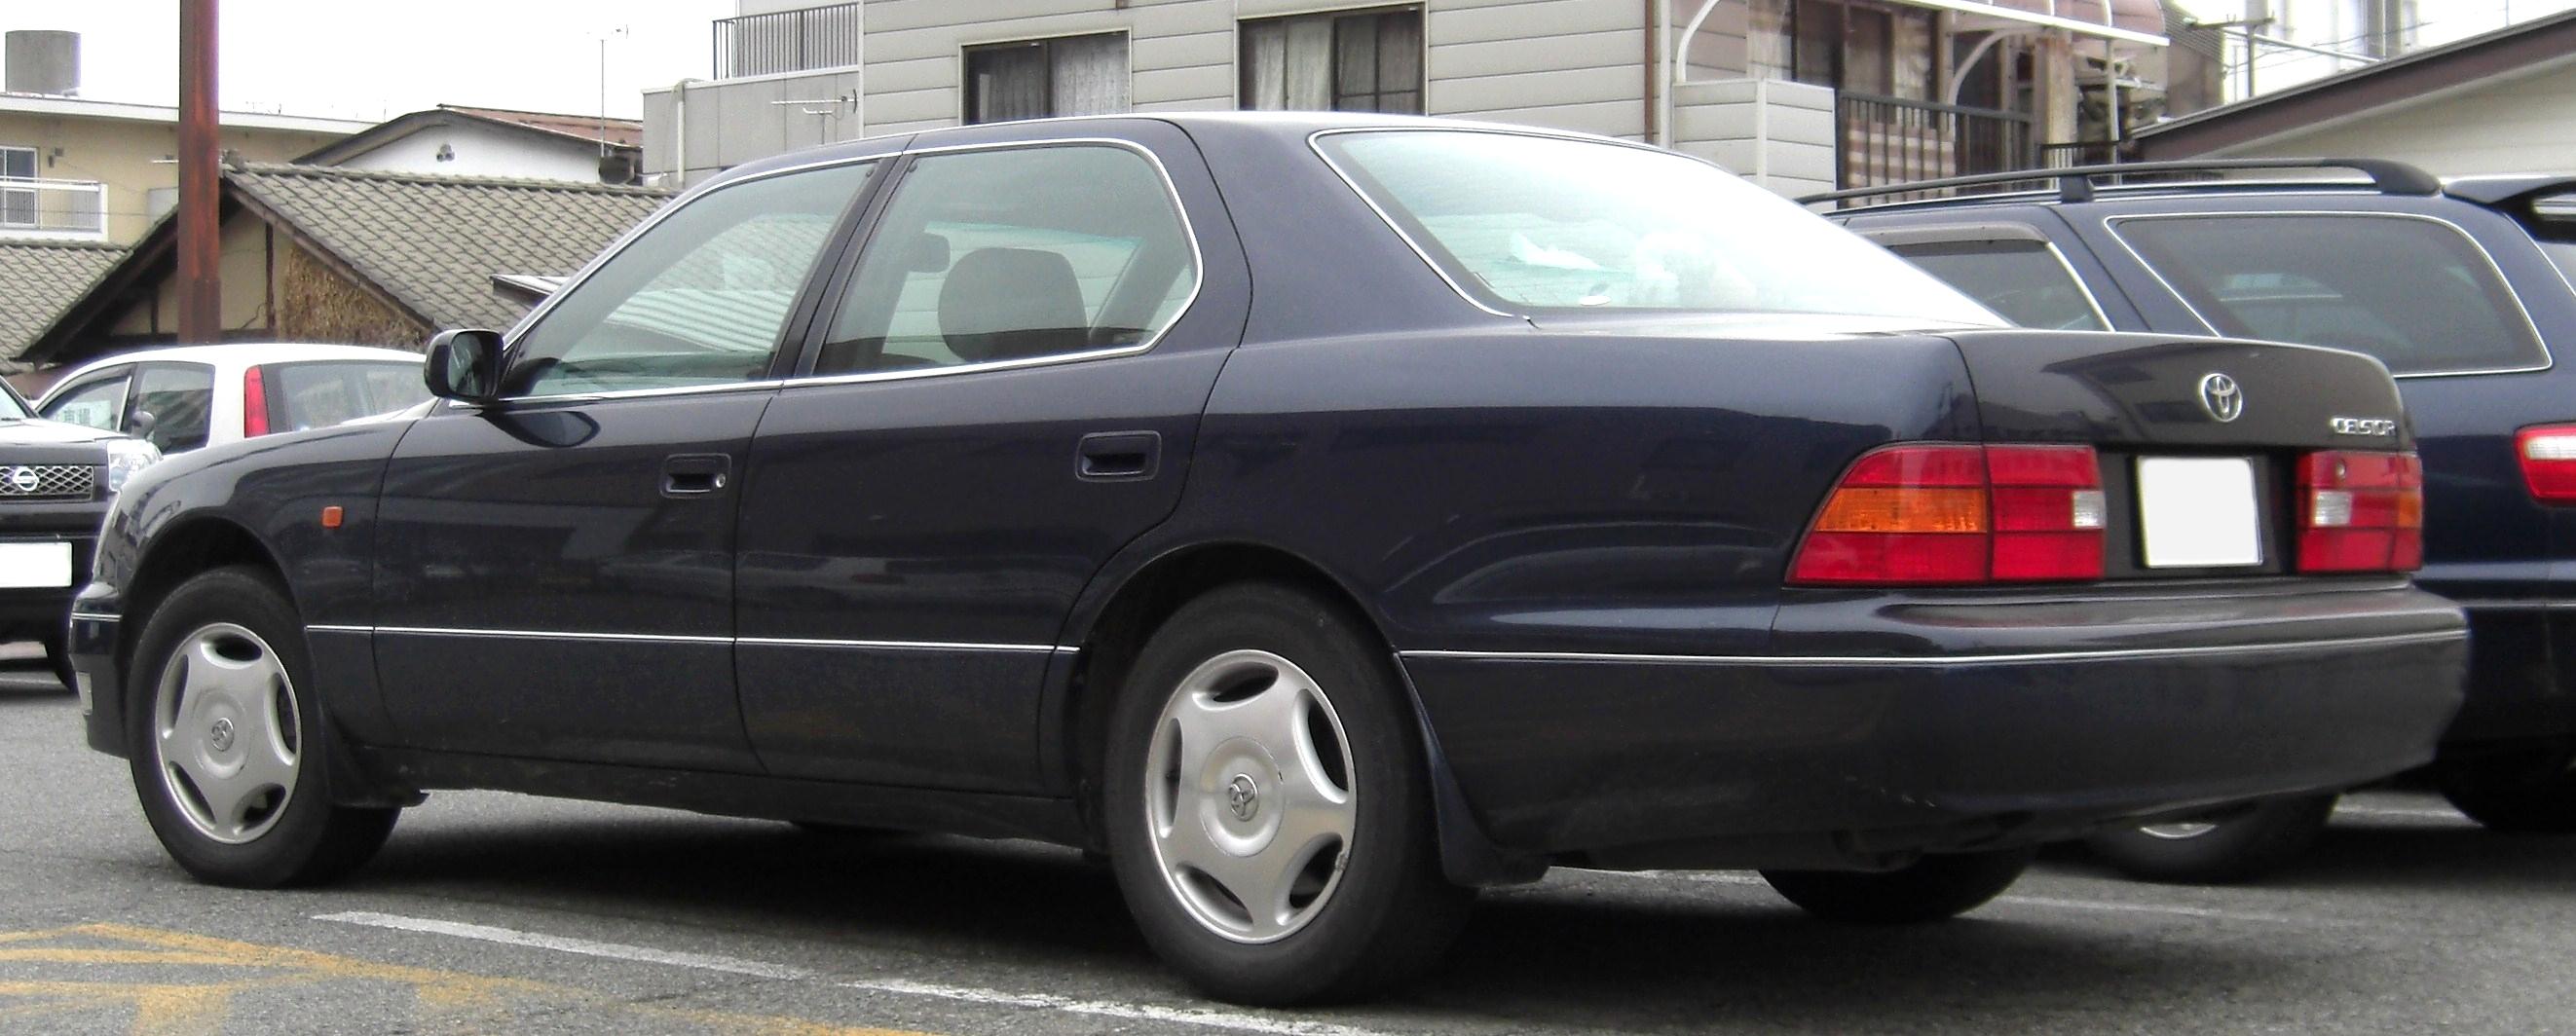 File 1997 2000 Toyota Celsior Rear Jpg Wikimedia Commons